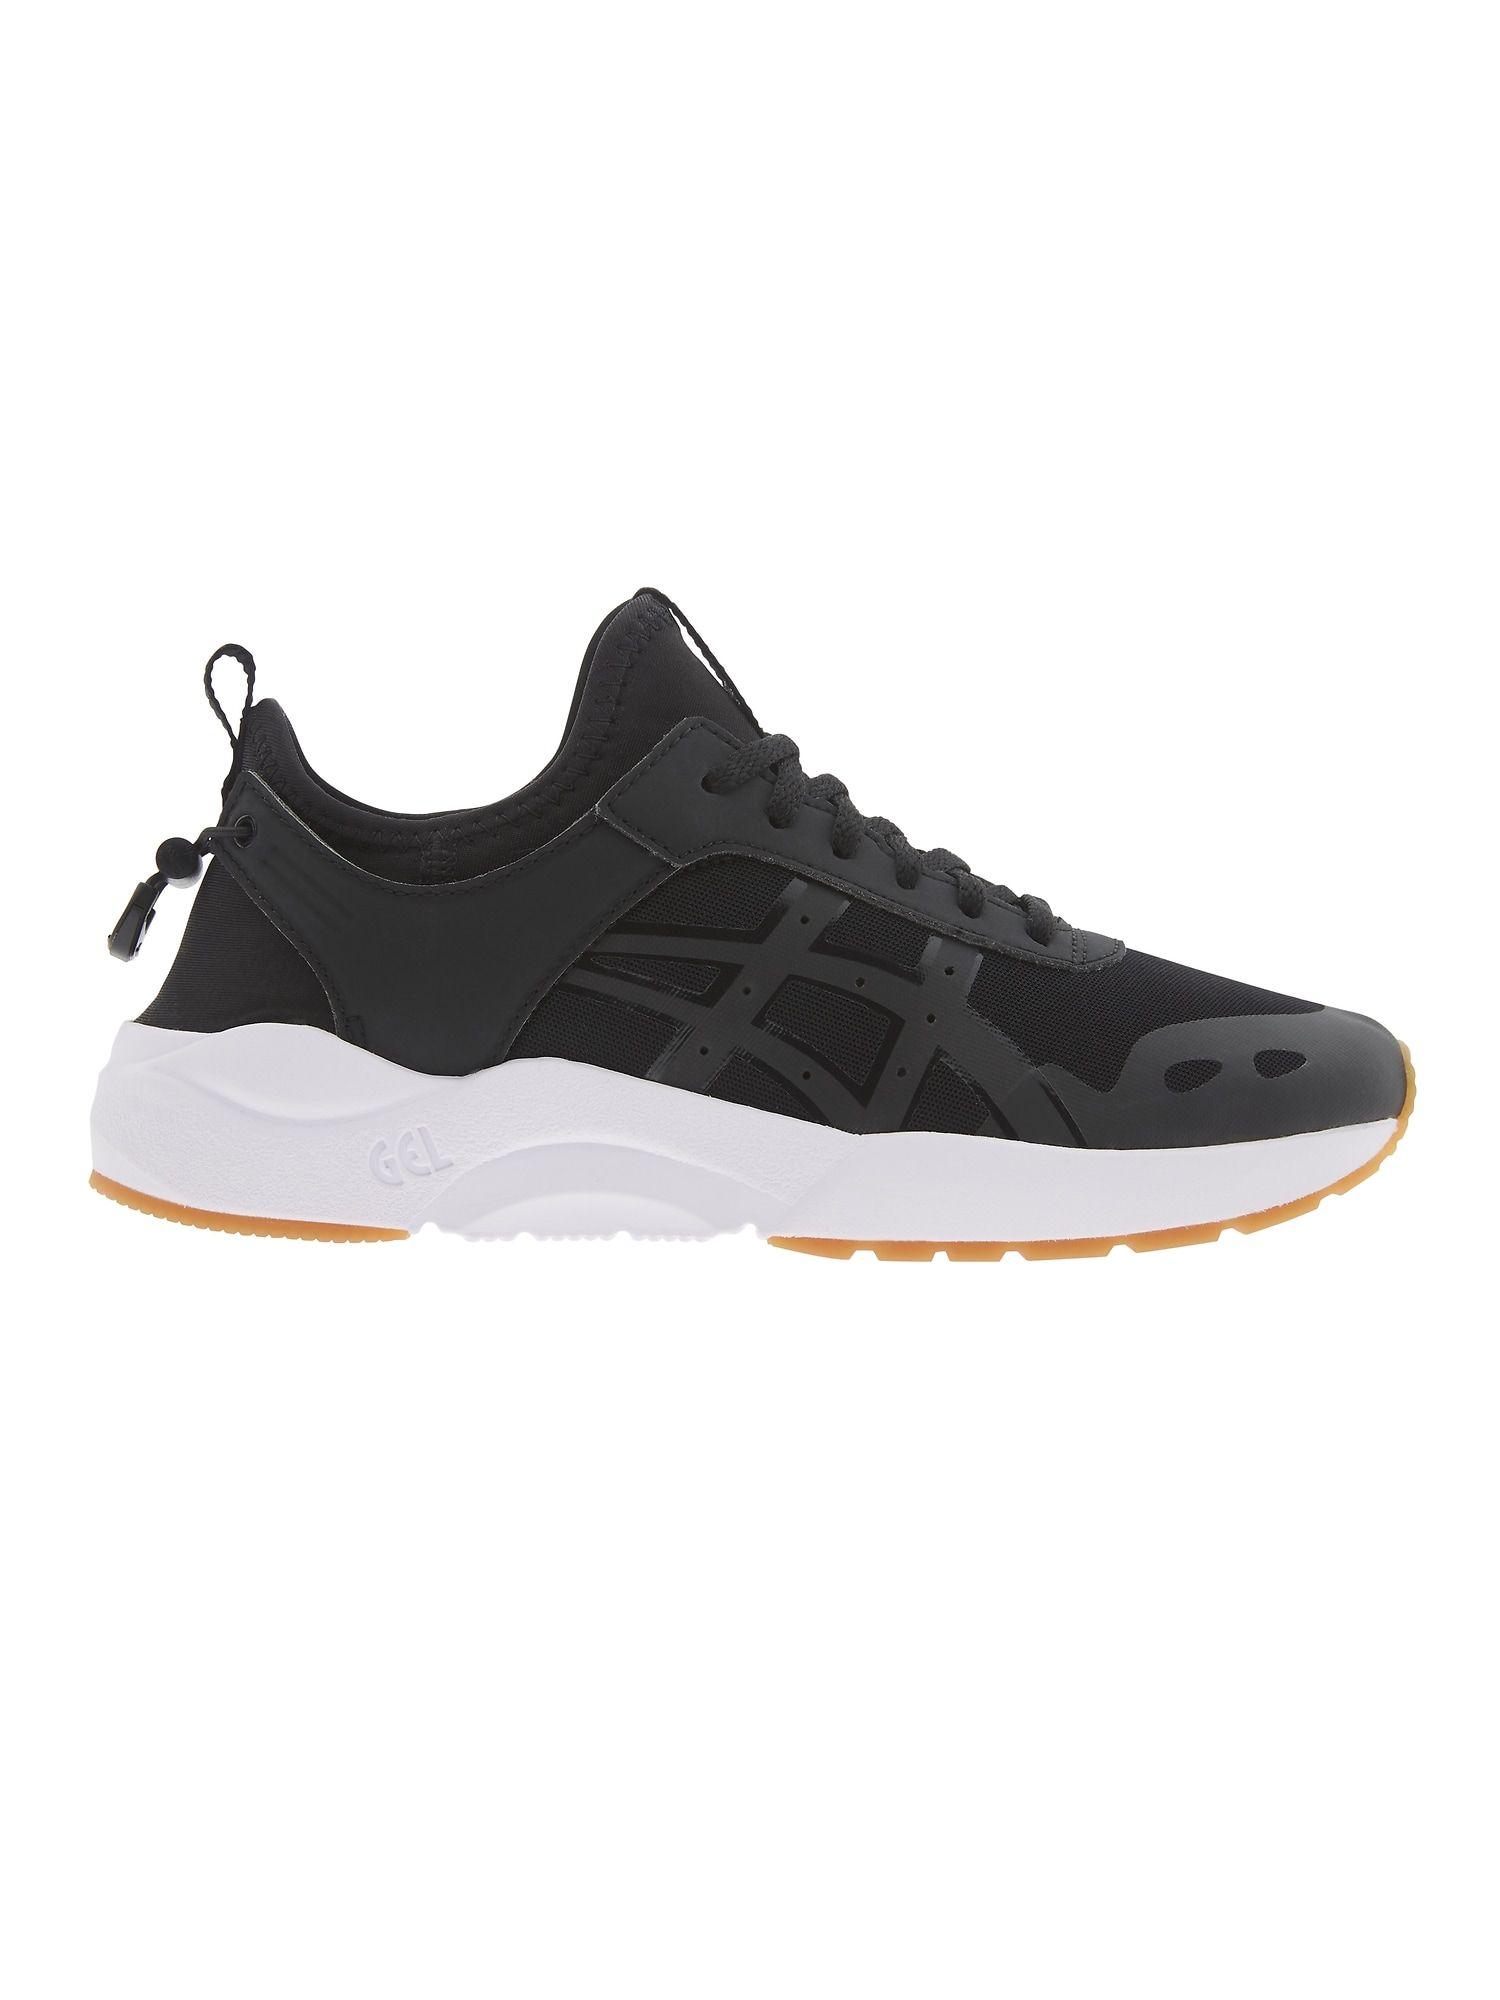 athleta tennis shoes